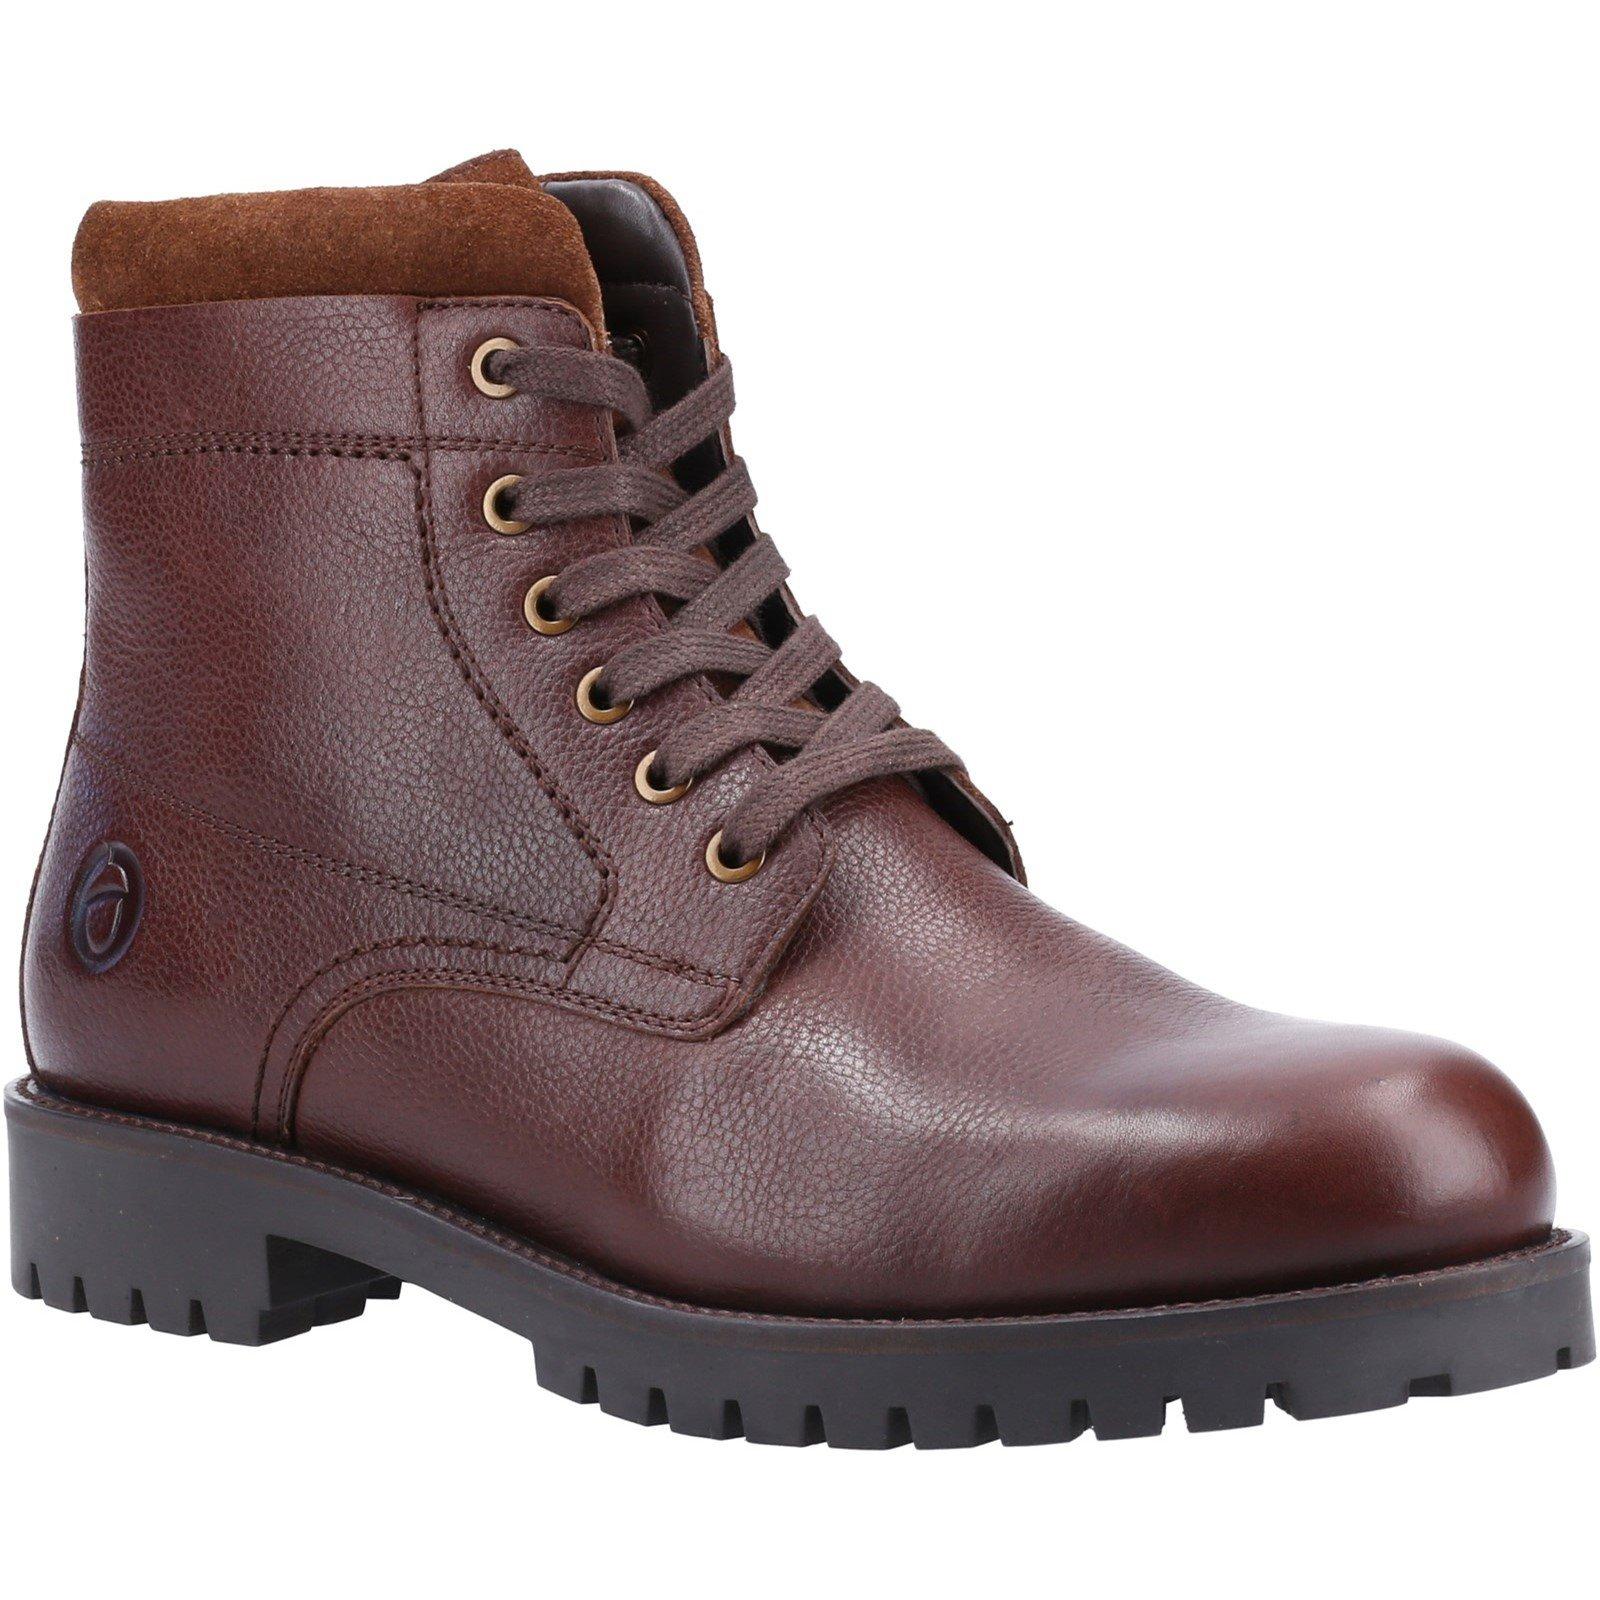 Cotswold Men's Thorsbury Lace Up Shoe Boot Various Colours 32963 - Brown 8